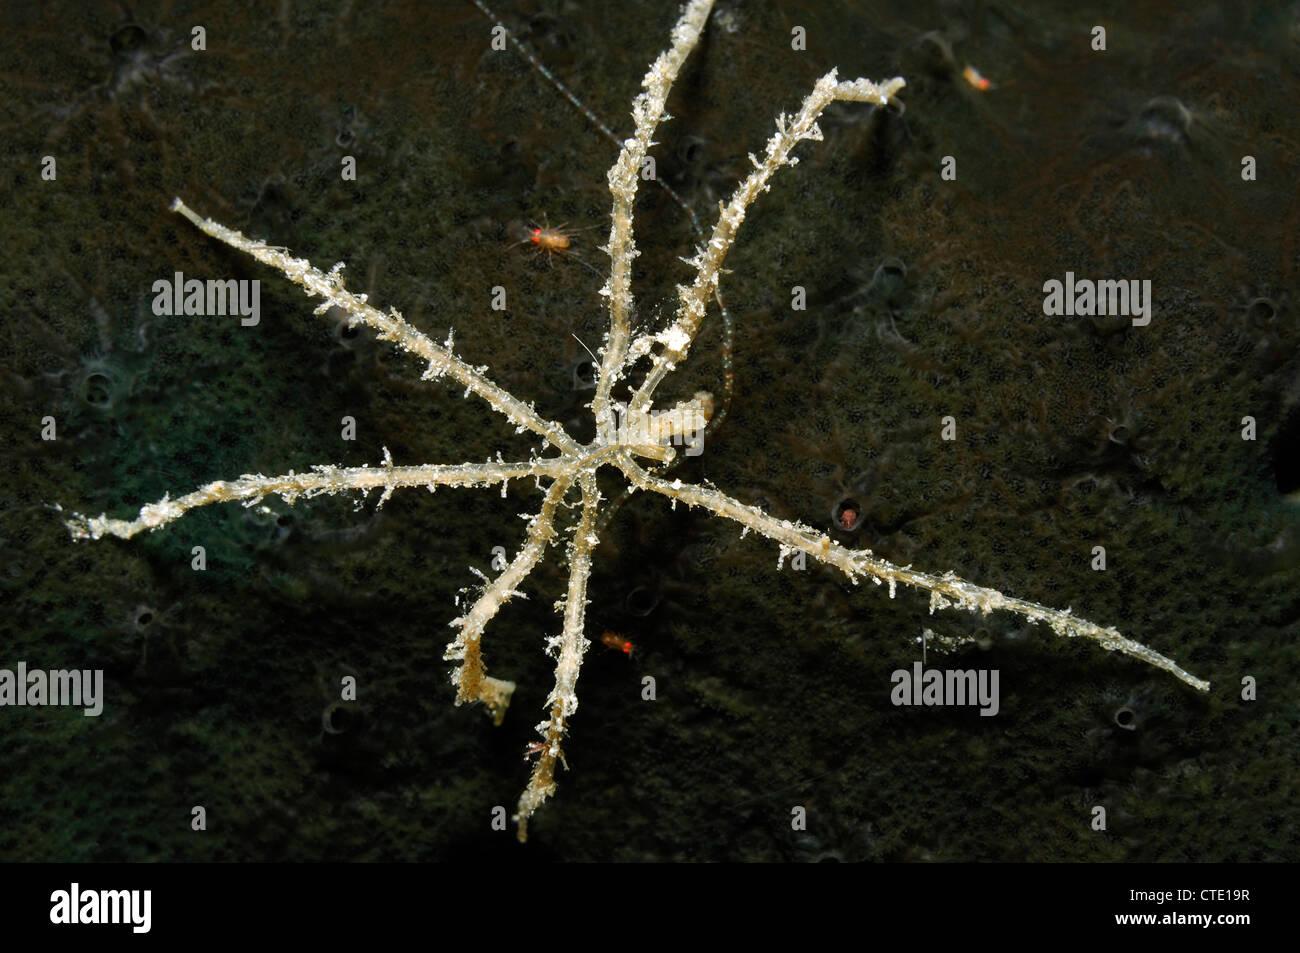 Marine Sea Spider, Nymphon sp., Bunaken, North Sulawesi, Indonesia - Stock Image